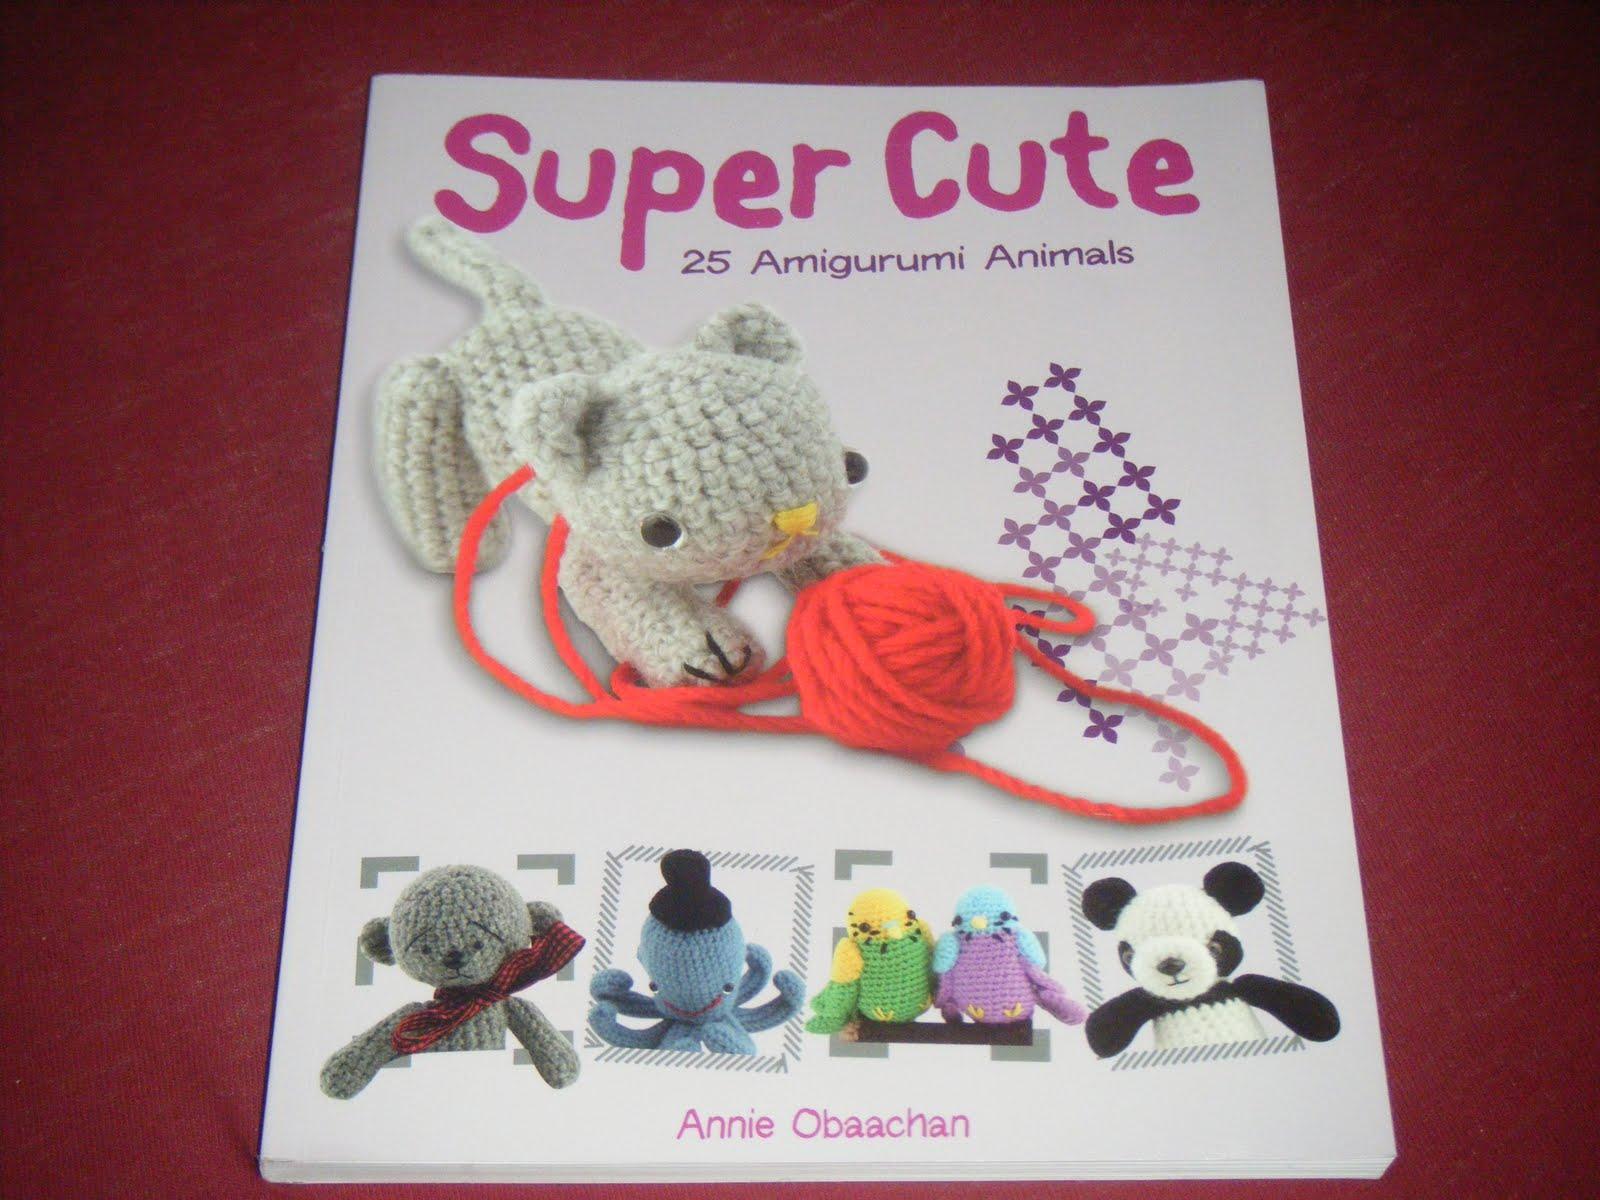 Super Cute 25 Amigurumi Animals To Make : The glorious books!: Super cute: 25 amigurumi animals